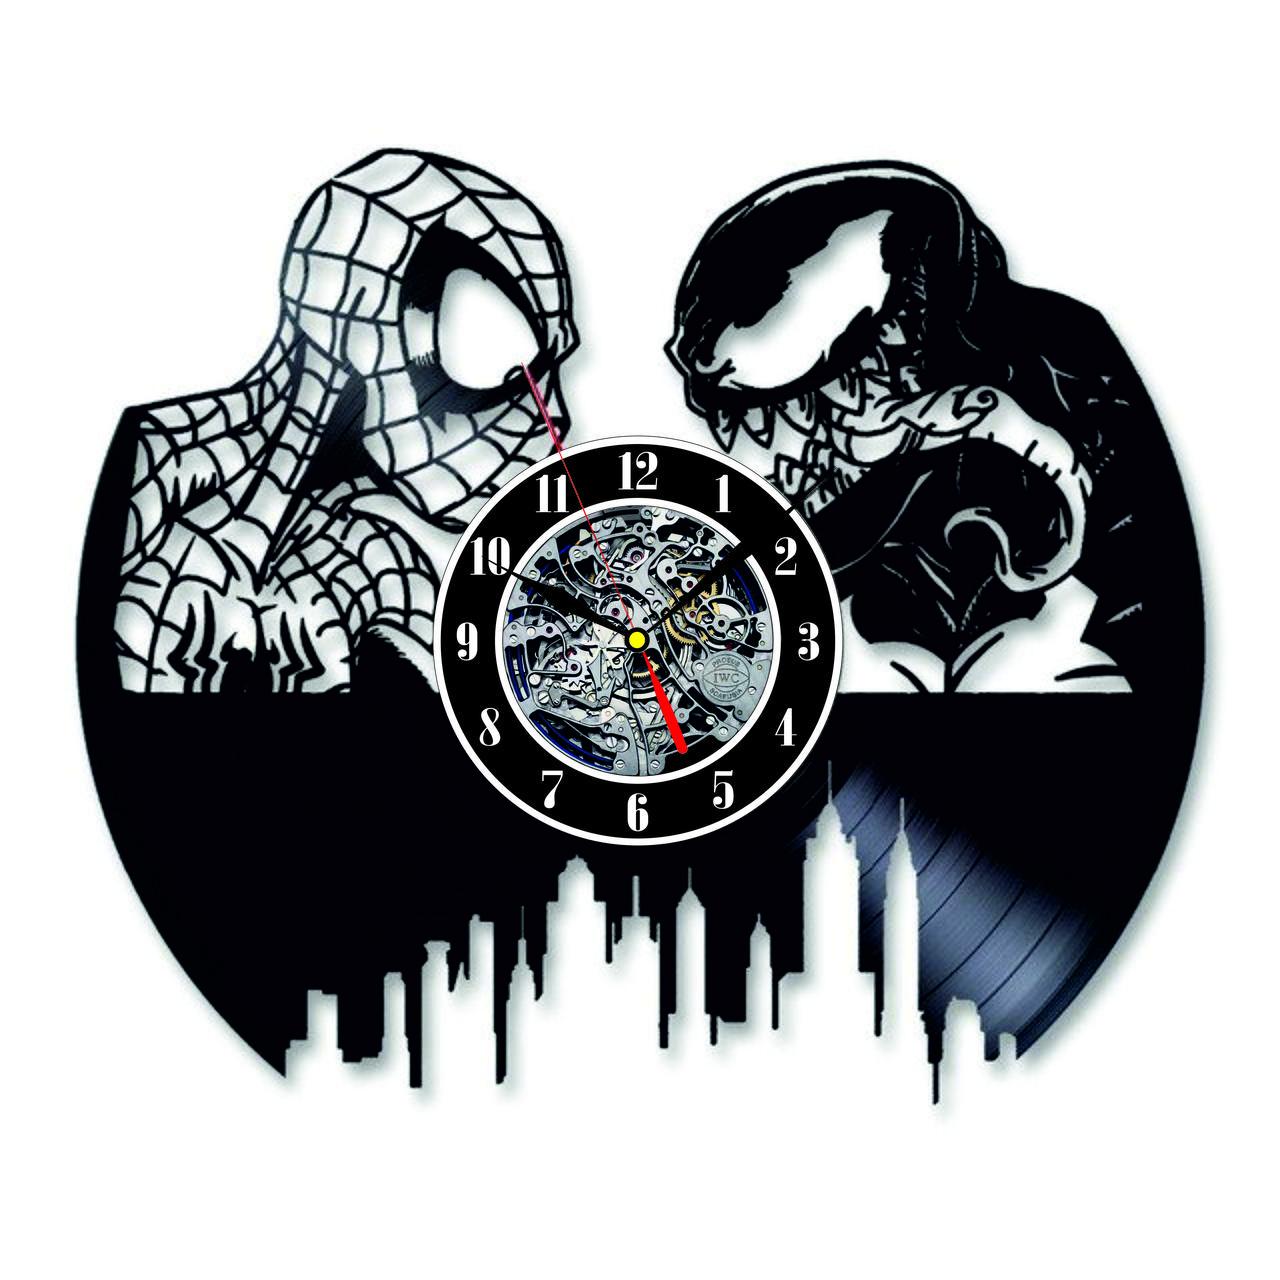 Настенные часы из виниловых пластинок LikeMark Spiderman vs Venom